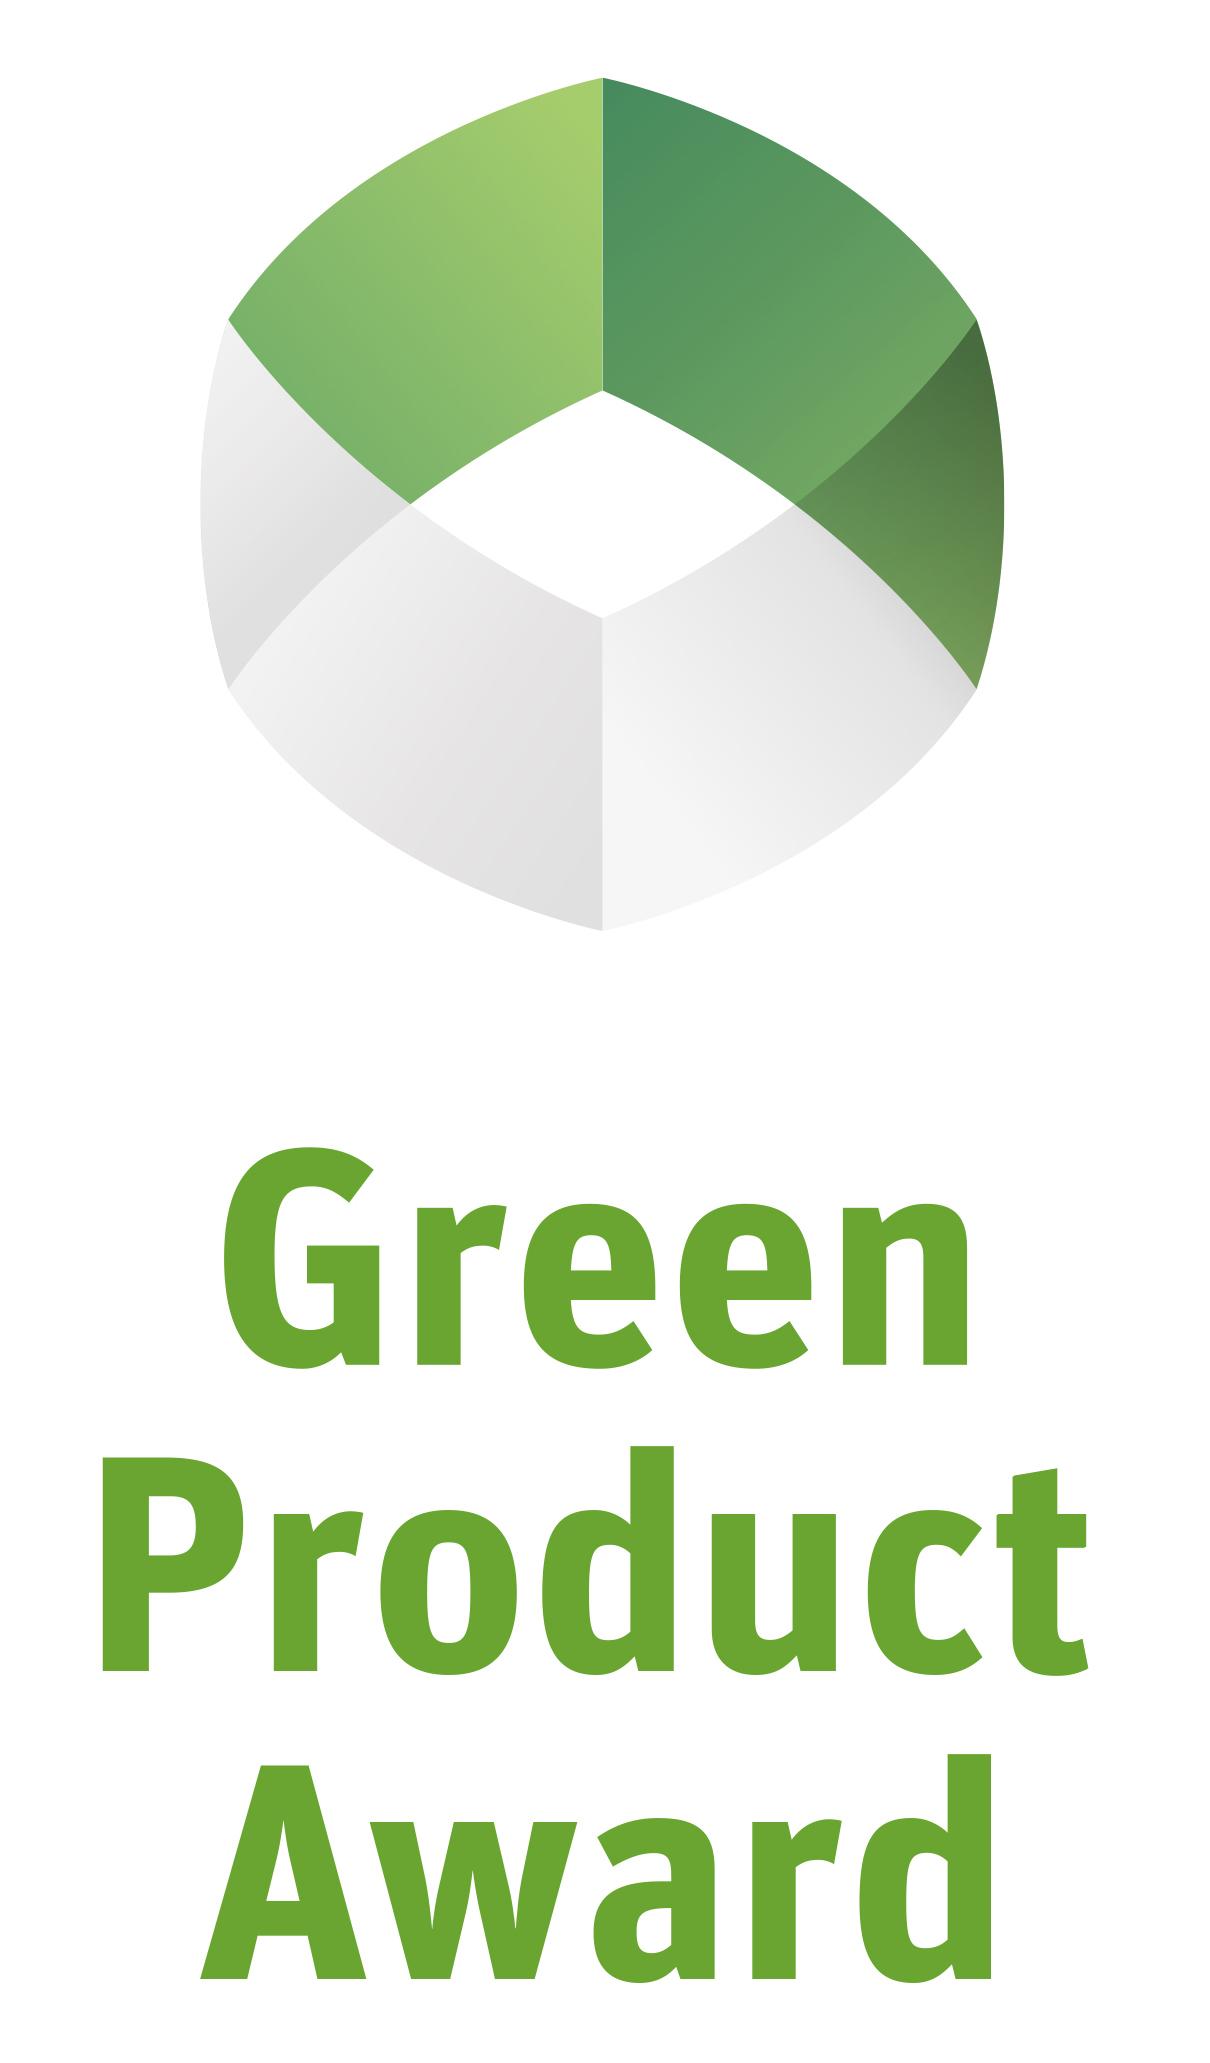 Green Product Award Winner 2018 Logo